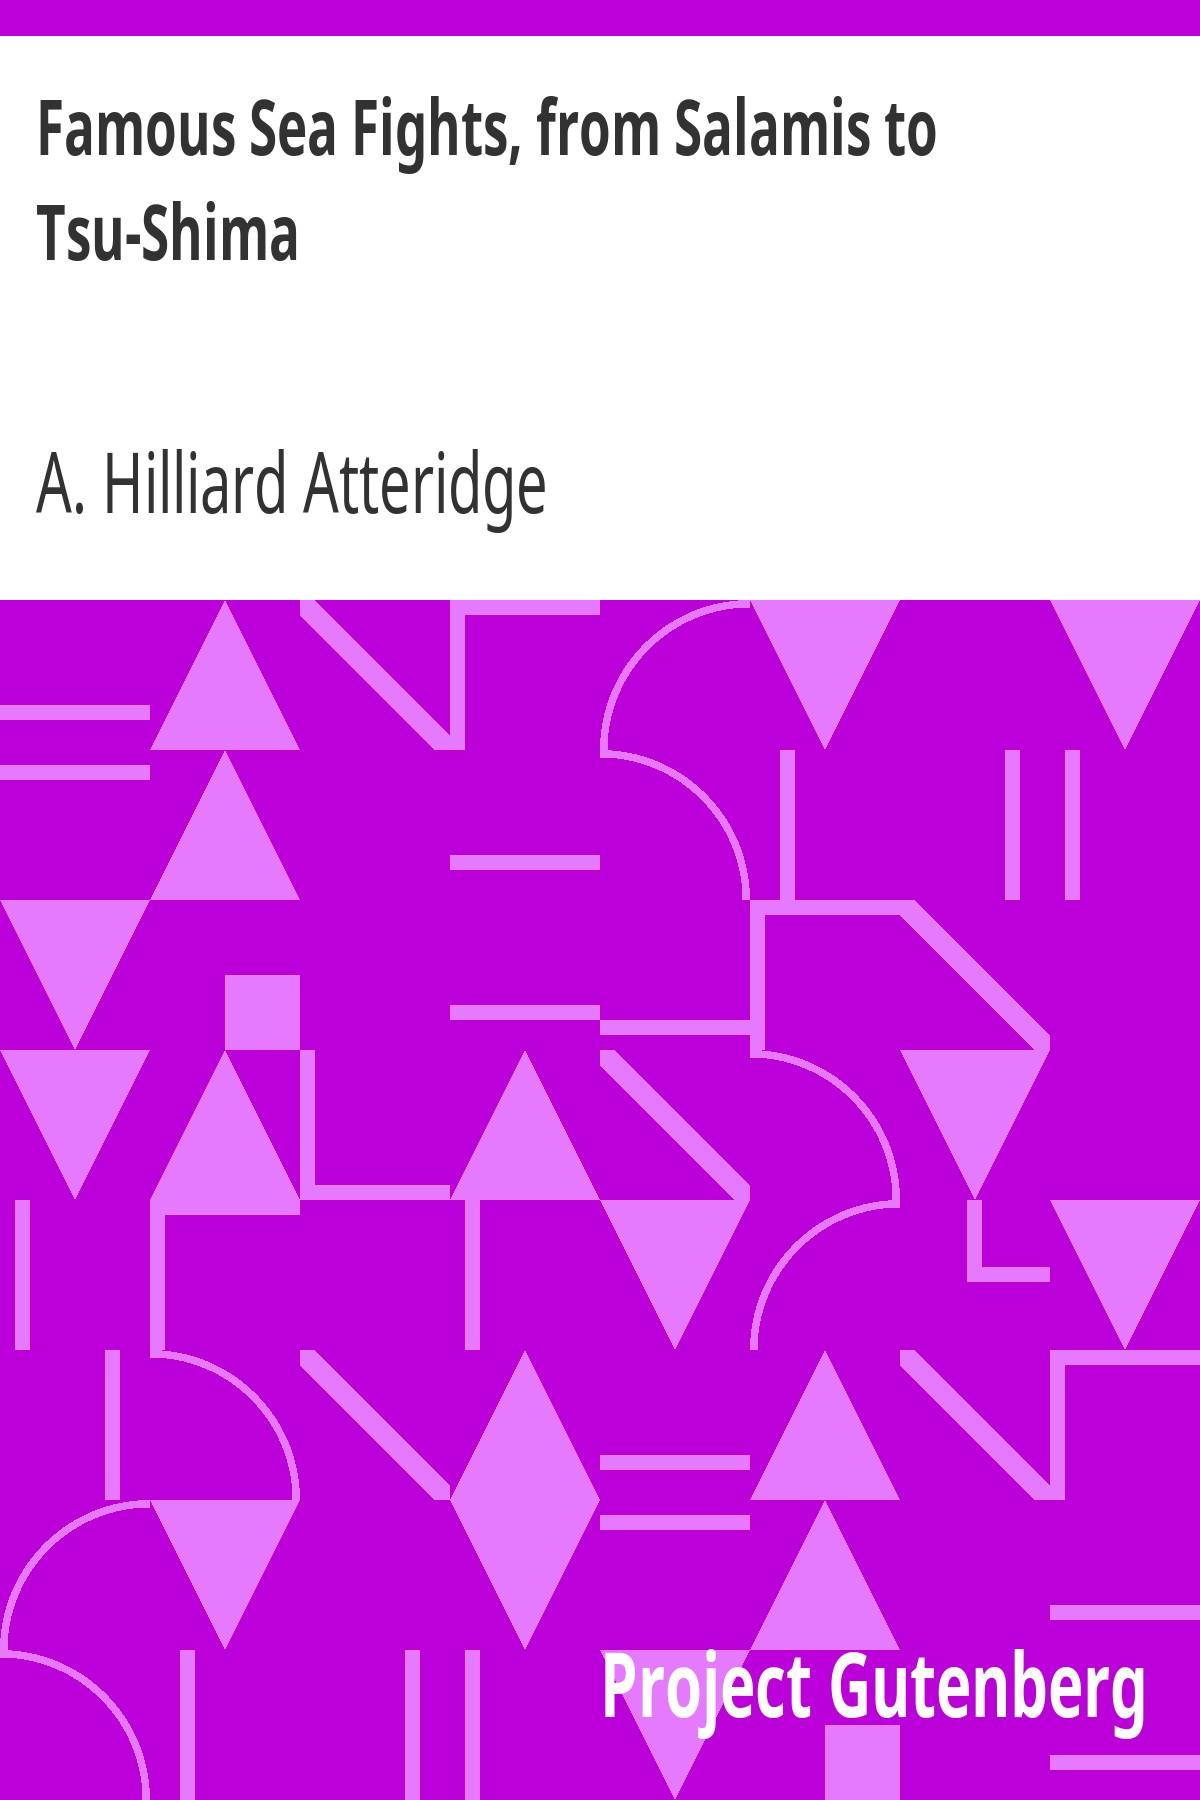 Andrew Hilliard Atteridge Famous Sea Fights, from Salamis to Tsu-Shima